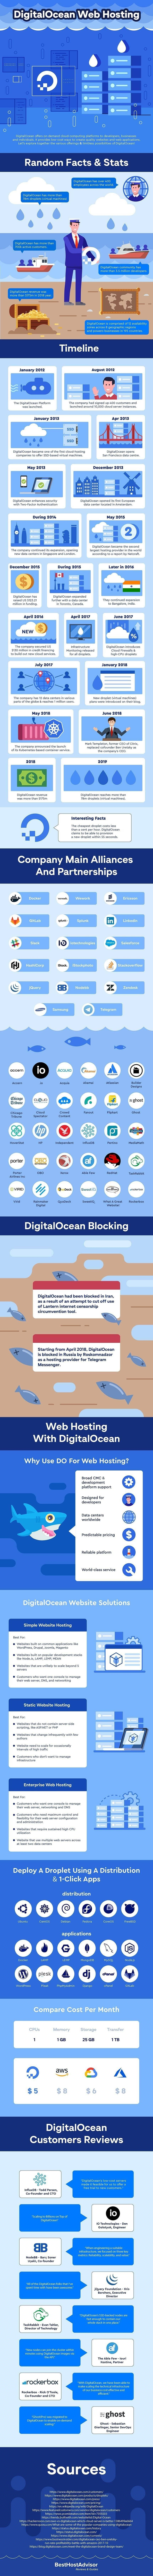 Digital Ocean Web Hosting #infographic